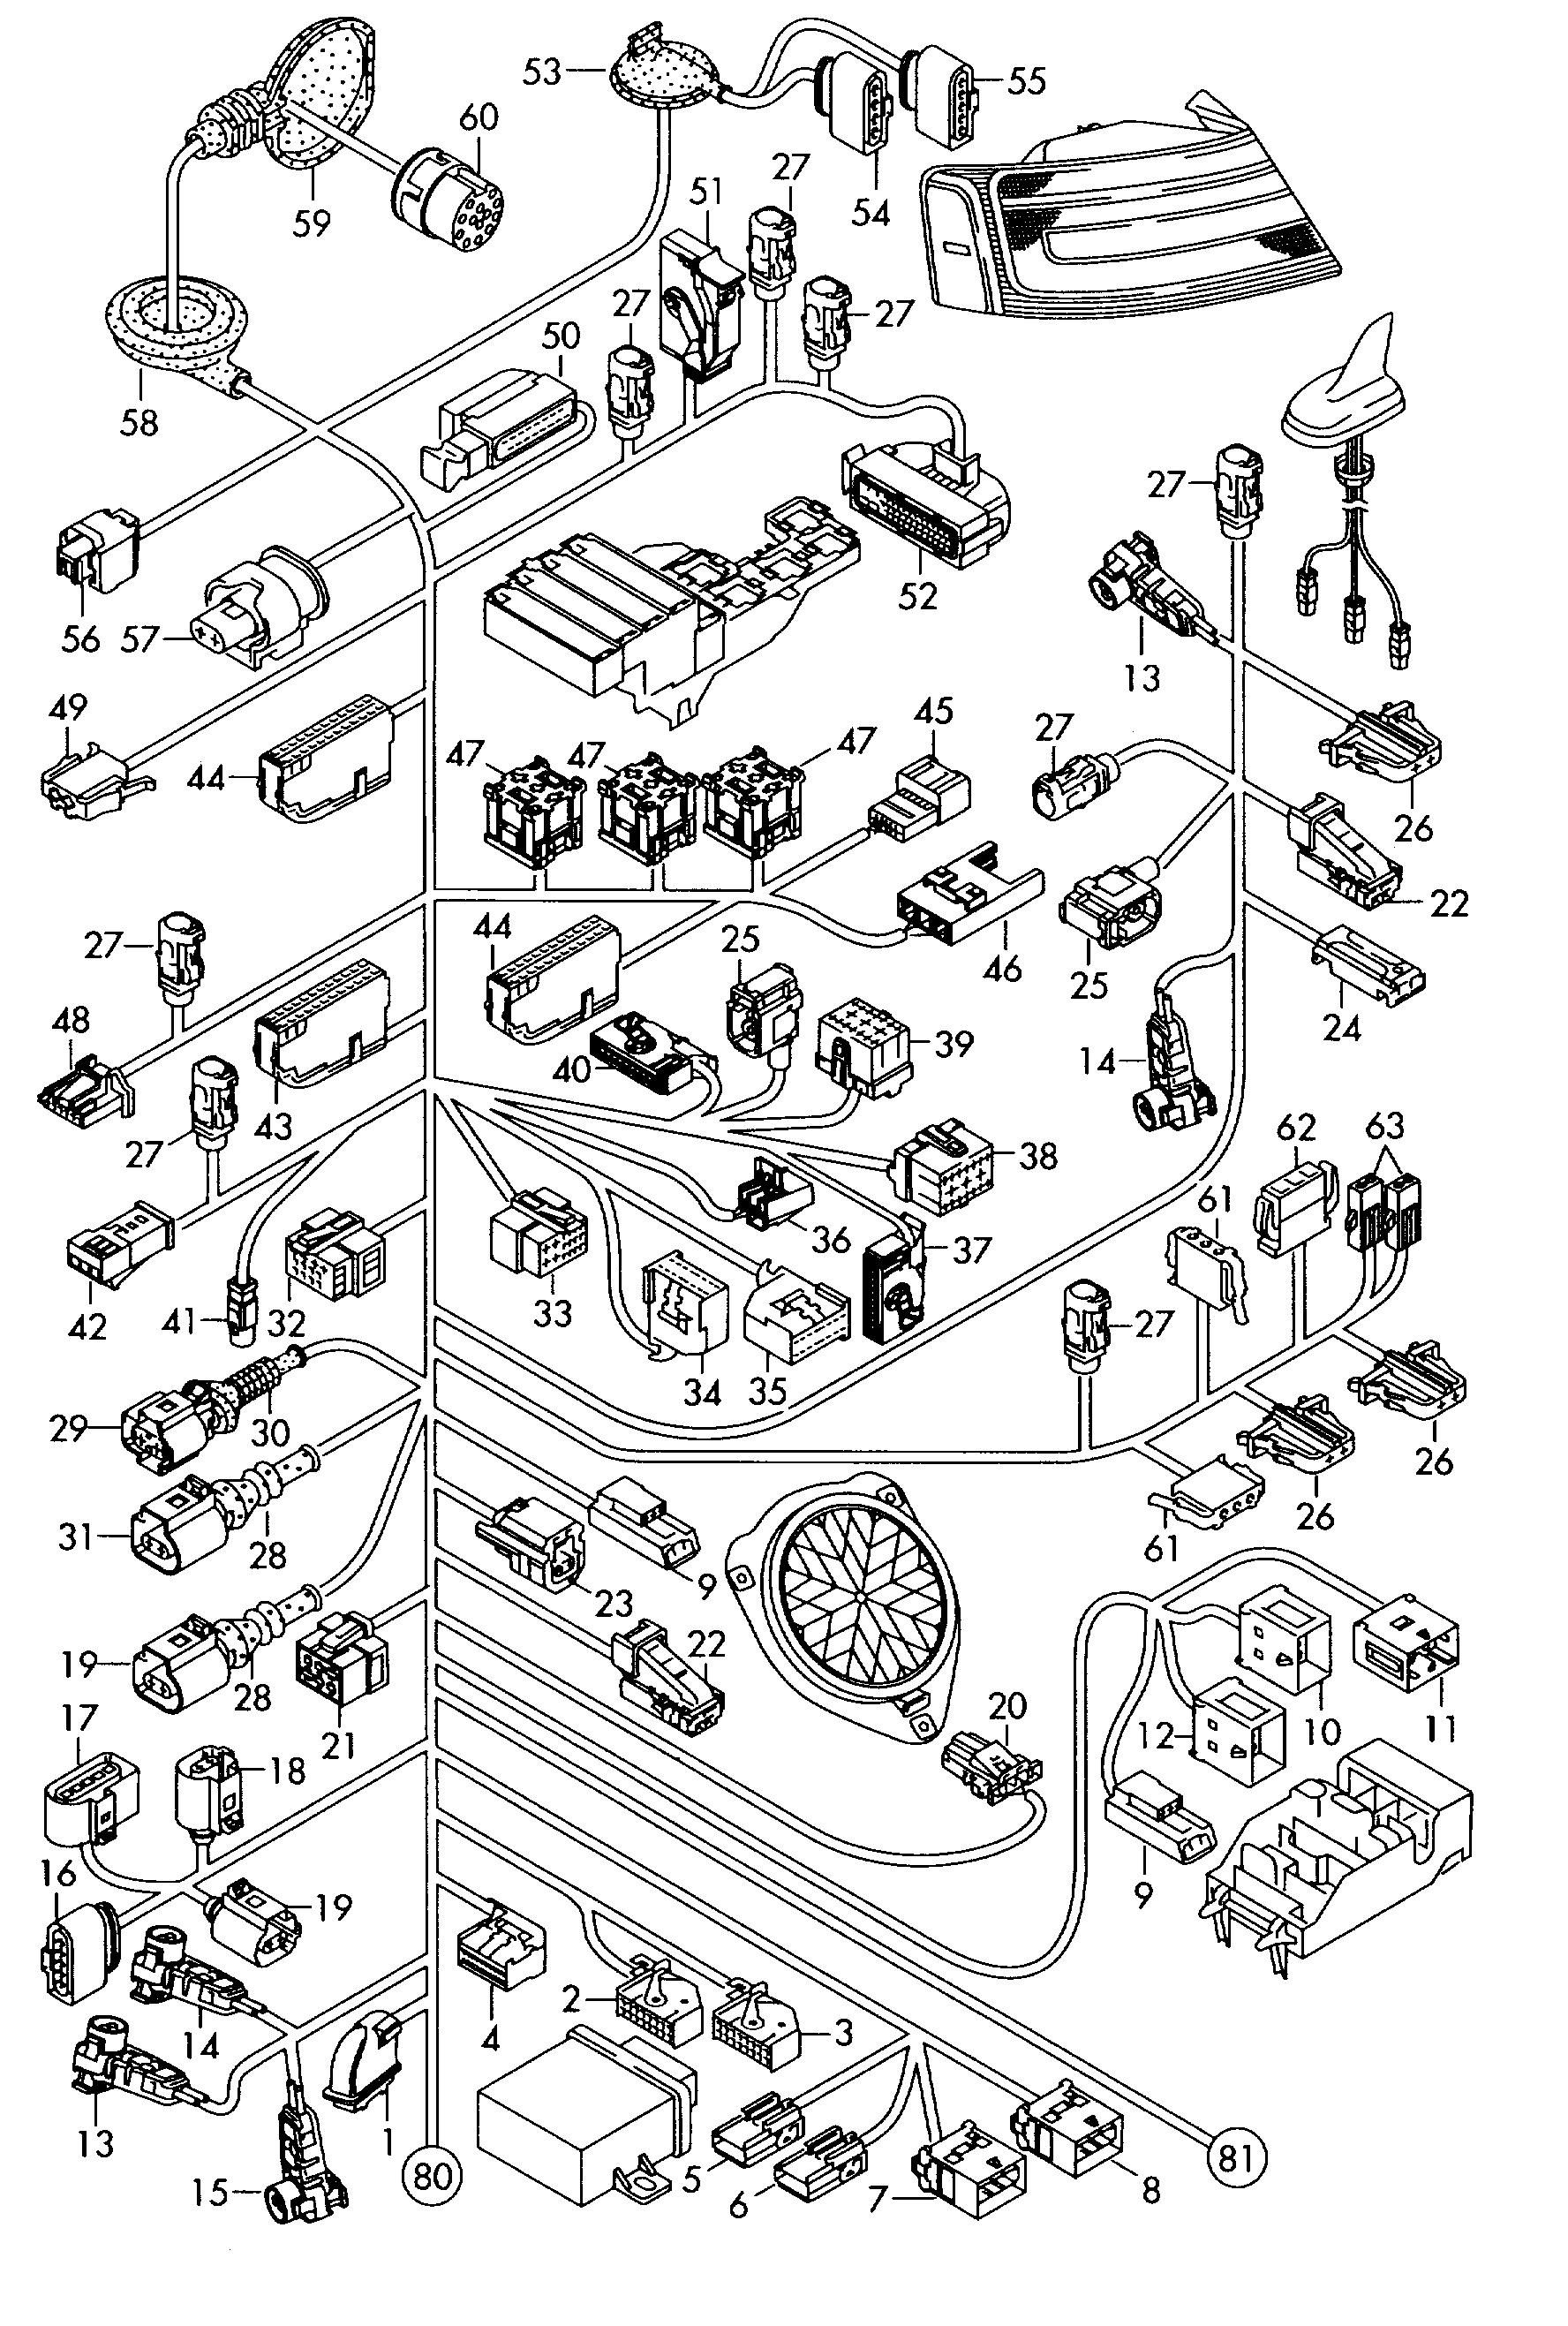 2008 Audi S5 Diagram - Wiring Diagram point chase-depart -  chase-depart.lauragiustibijoux.it | Audi A5 Wiring Diagram |  | Laura Giusti Bijoux